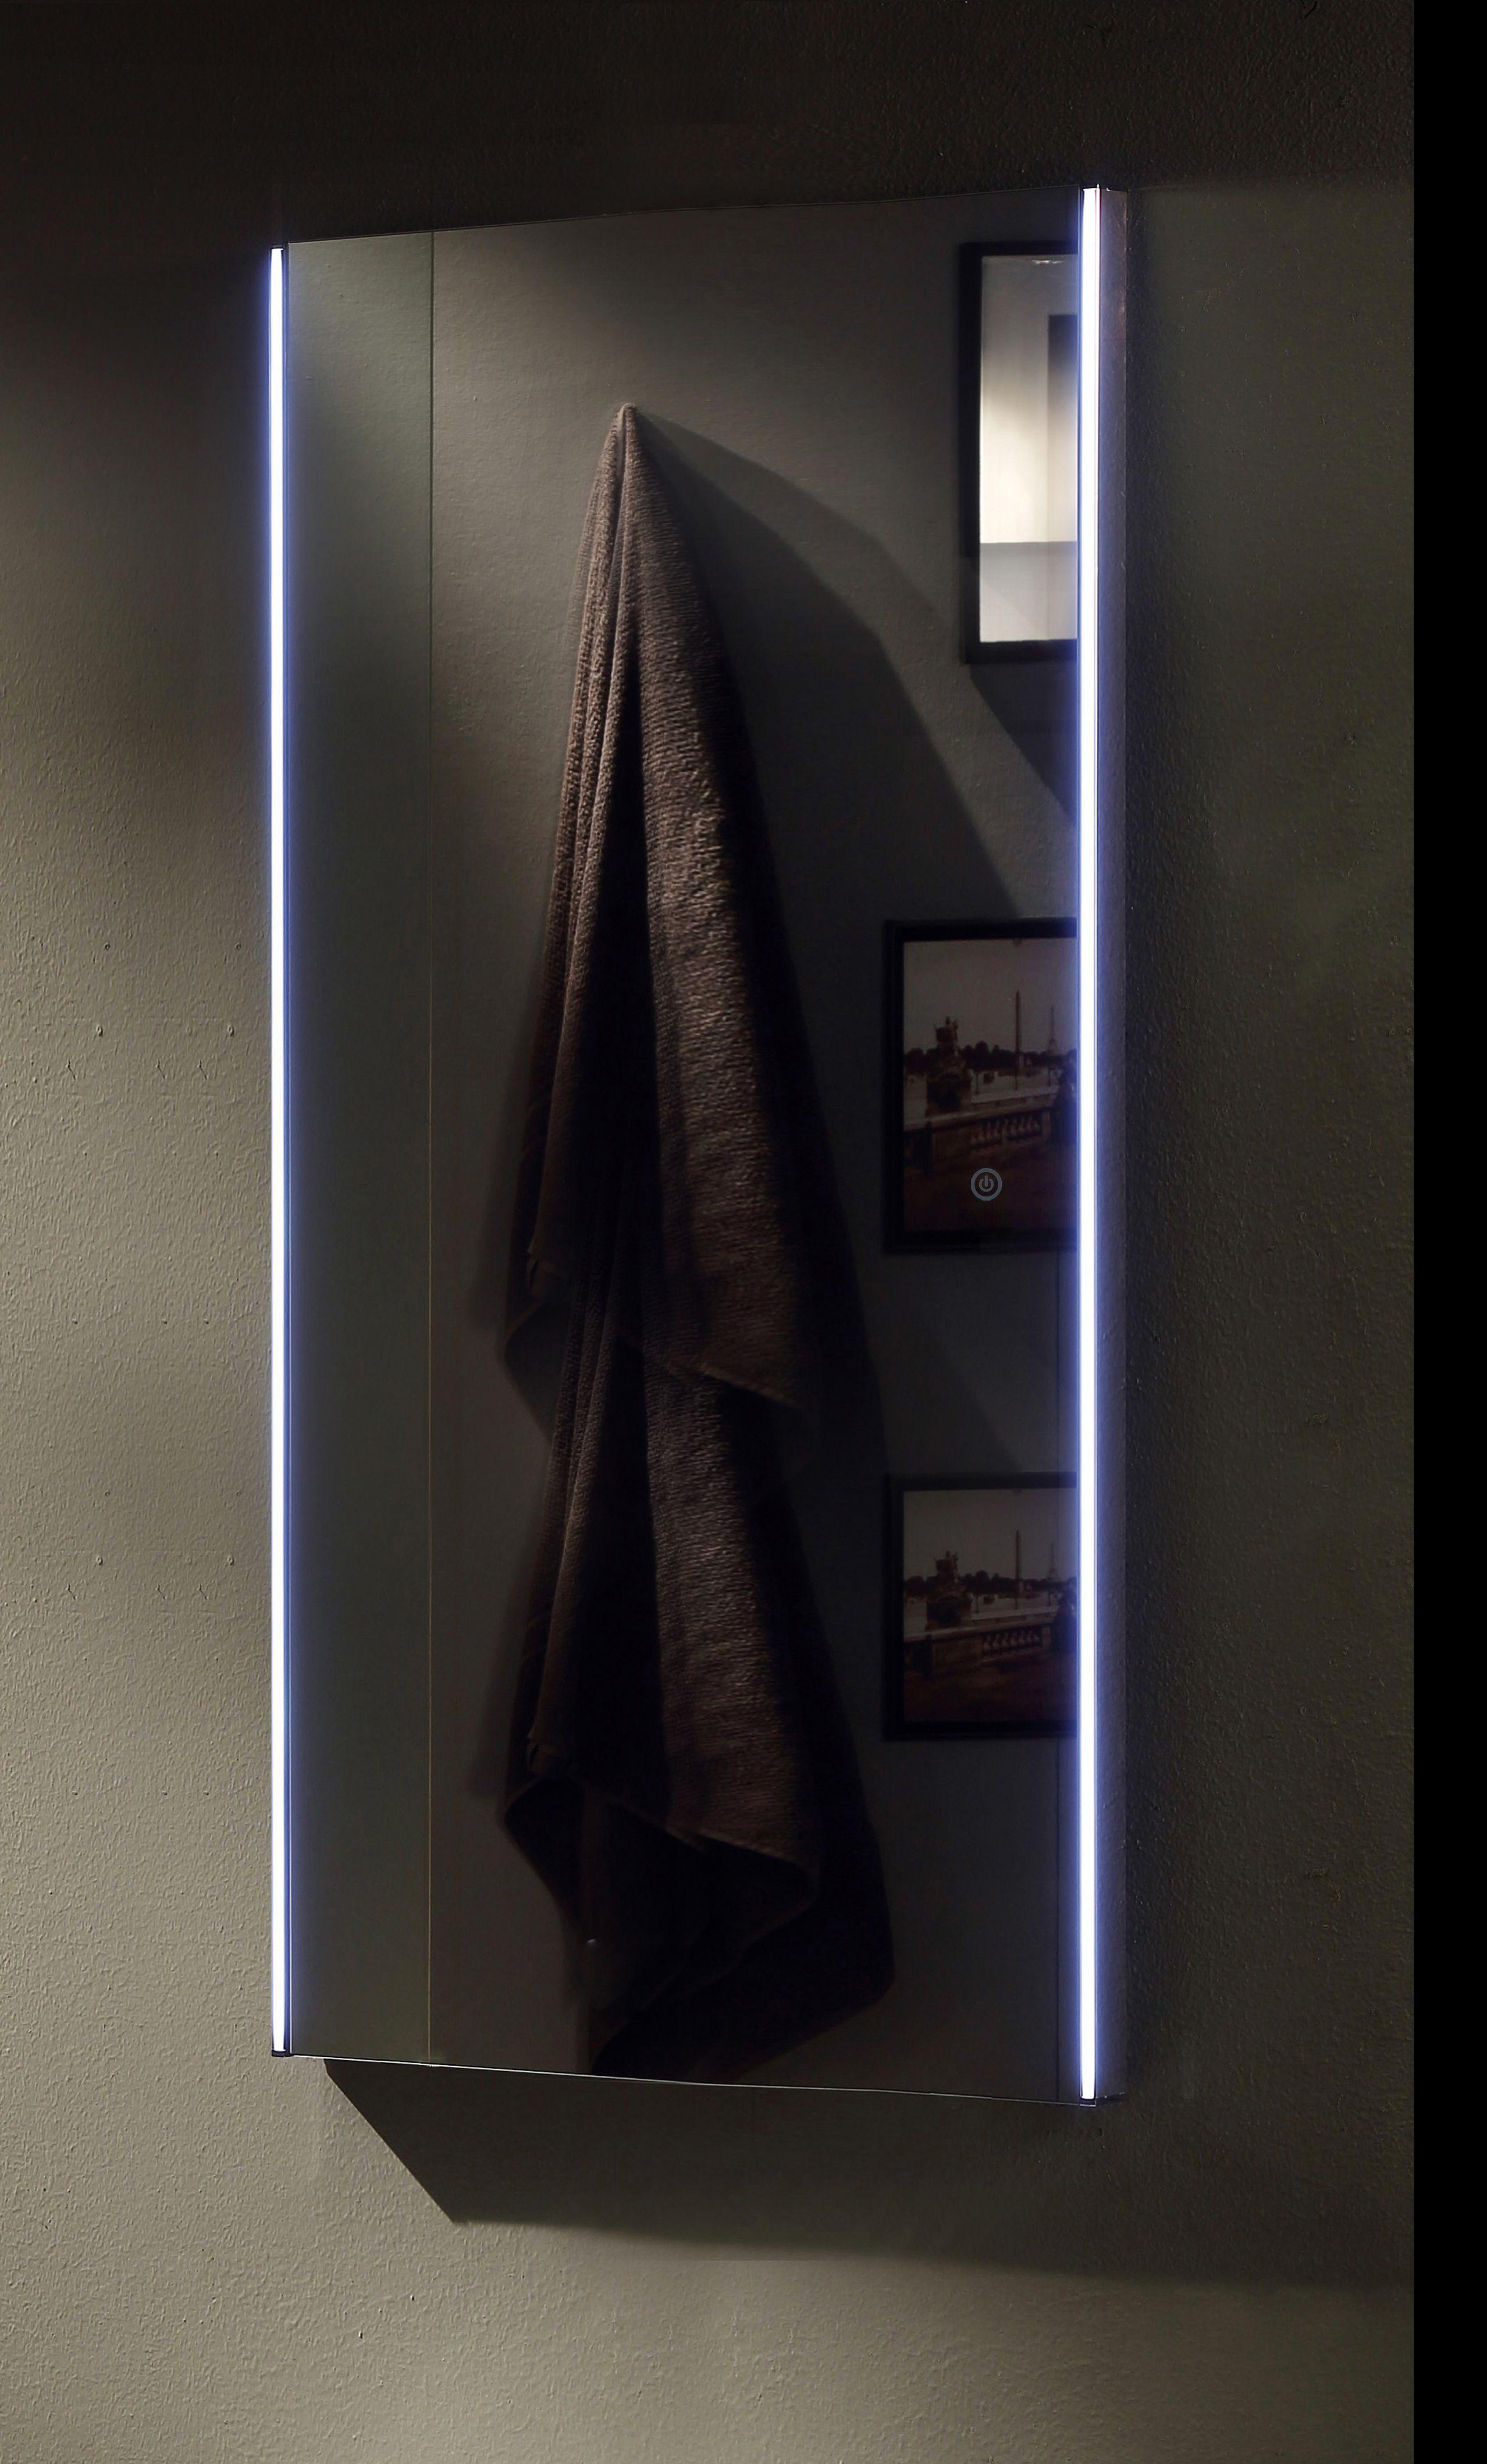 Backlit Mirror Remer Led Mirror Demister Pad Demister Mirror Smart Mirror Light Up Mirror Led Vanity Bedroom Bedroom Mirror Mirror Led Mirror Bathroom